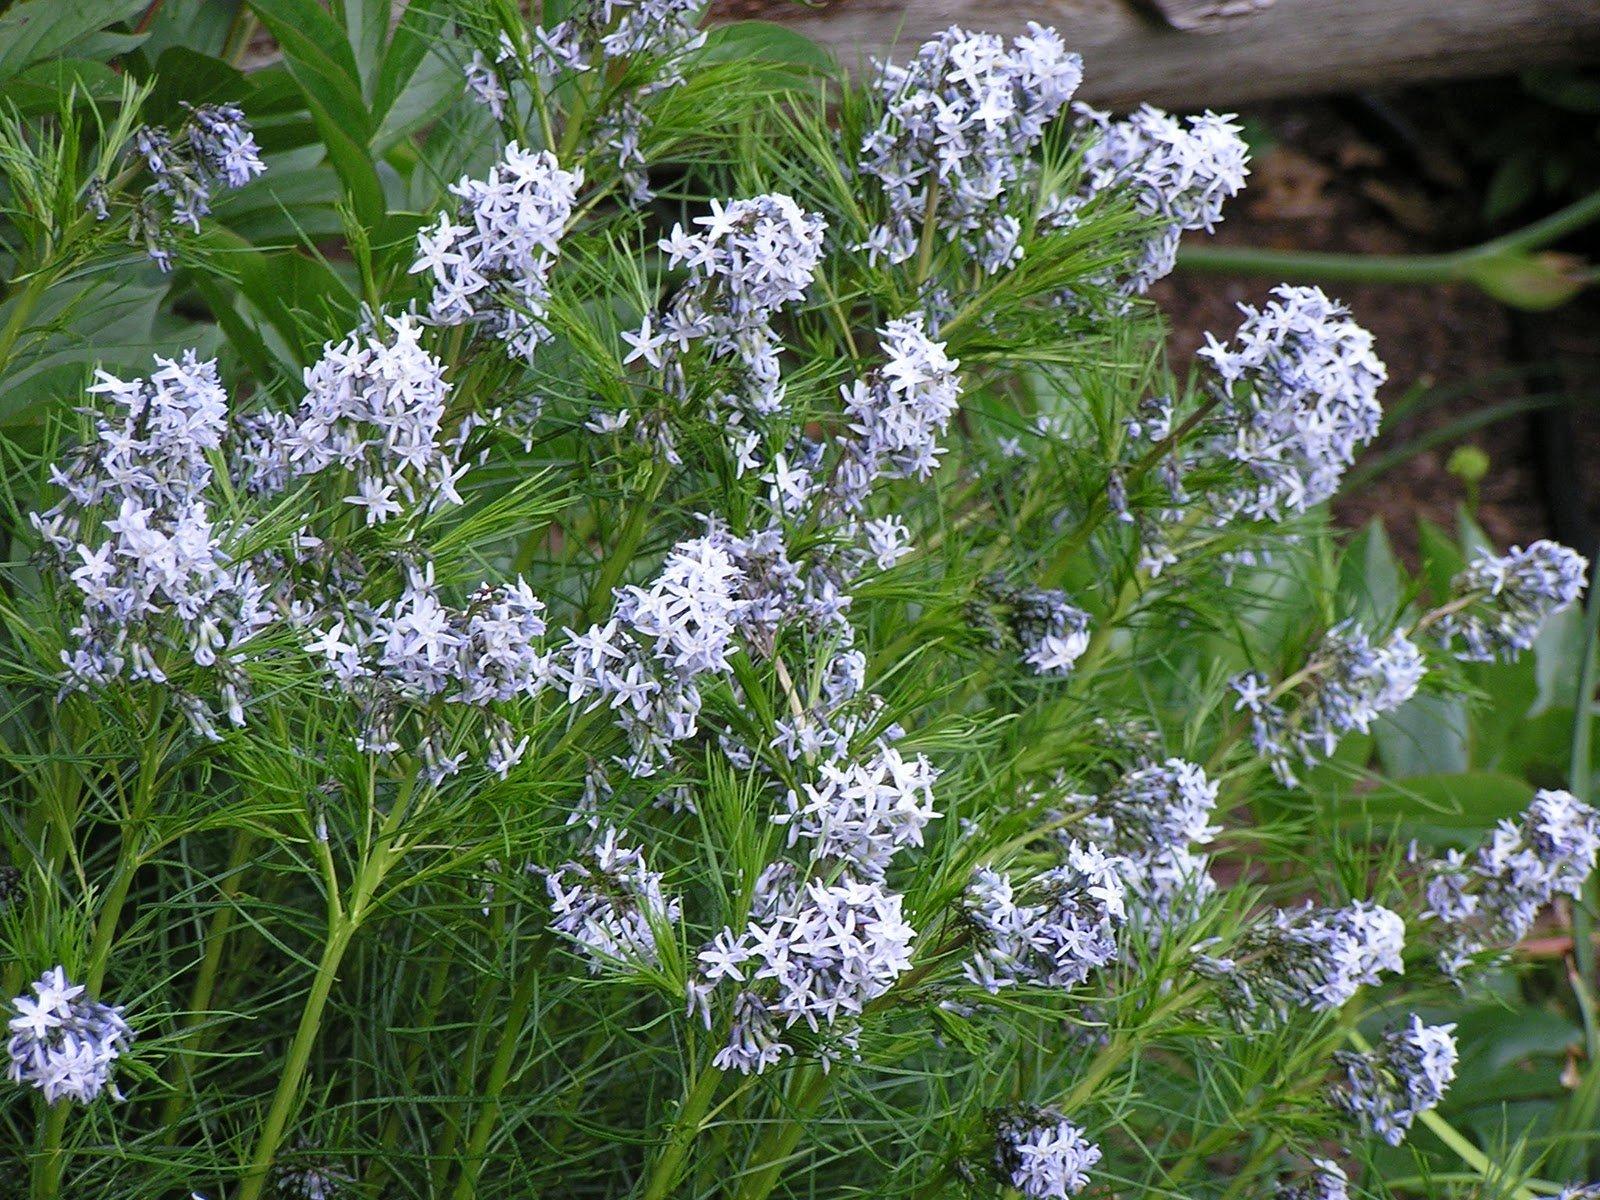 (1 gallon) AMSONIA hubrichtii Arkansas Blue Star, Feathery, soft-textured, needle-like leaves, bears lots of light blue flowers(Hydrangeas Shrub, Evergreens, Gardenia